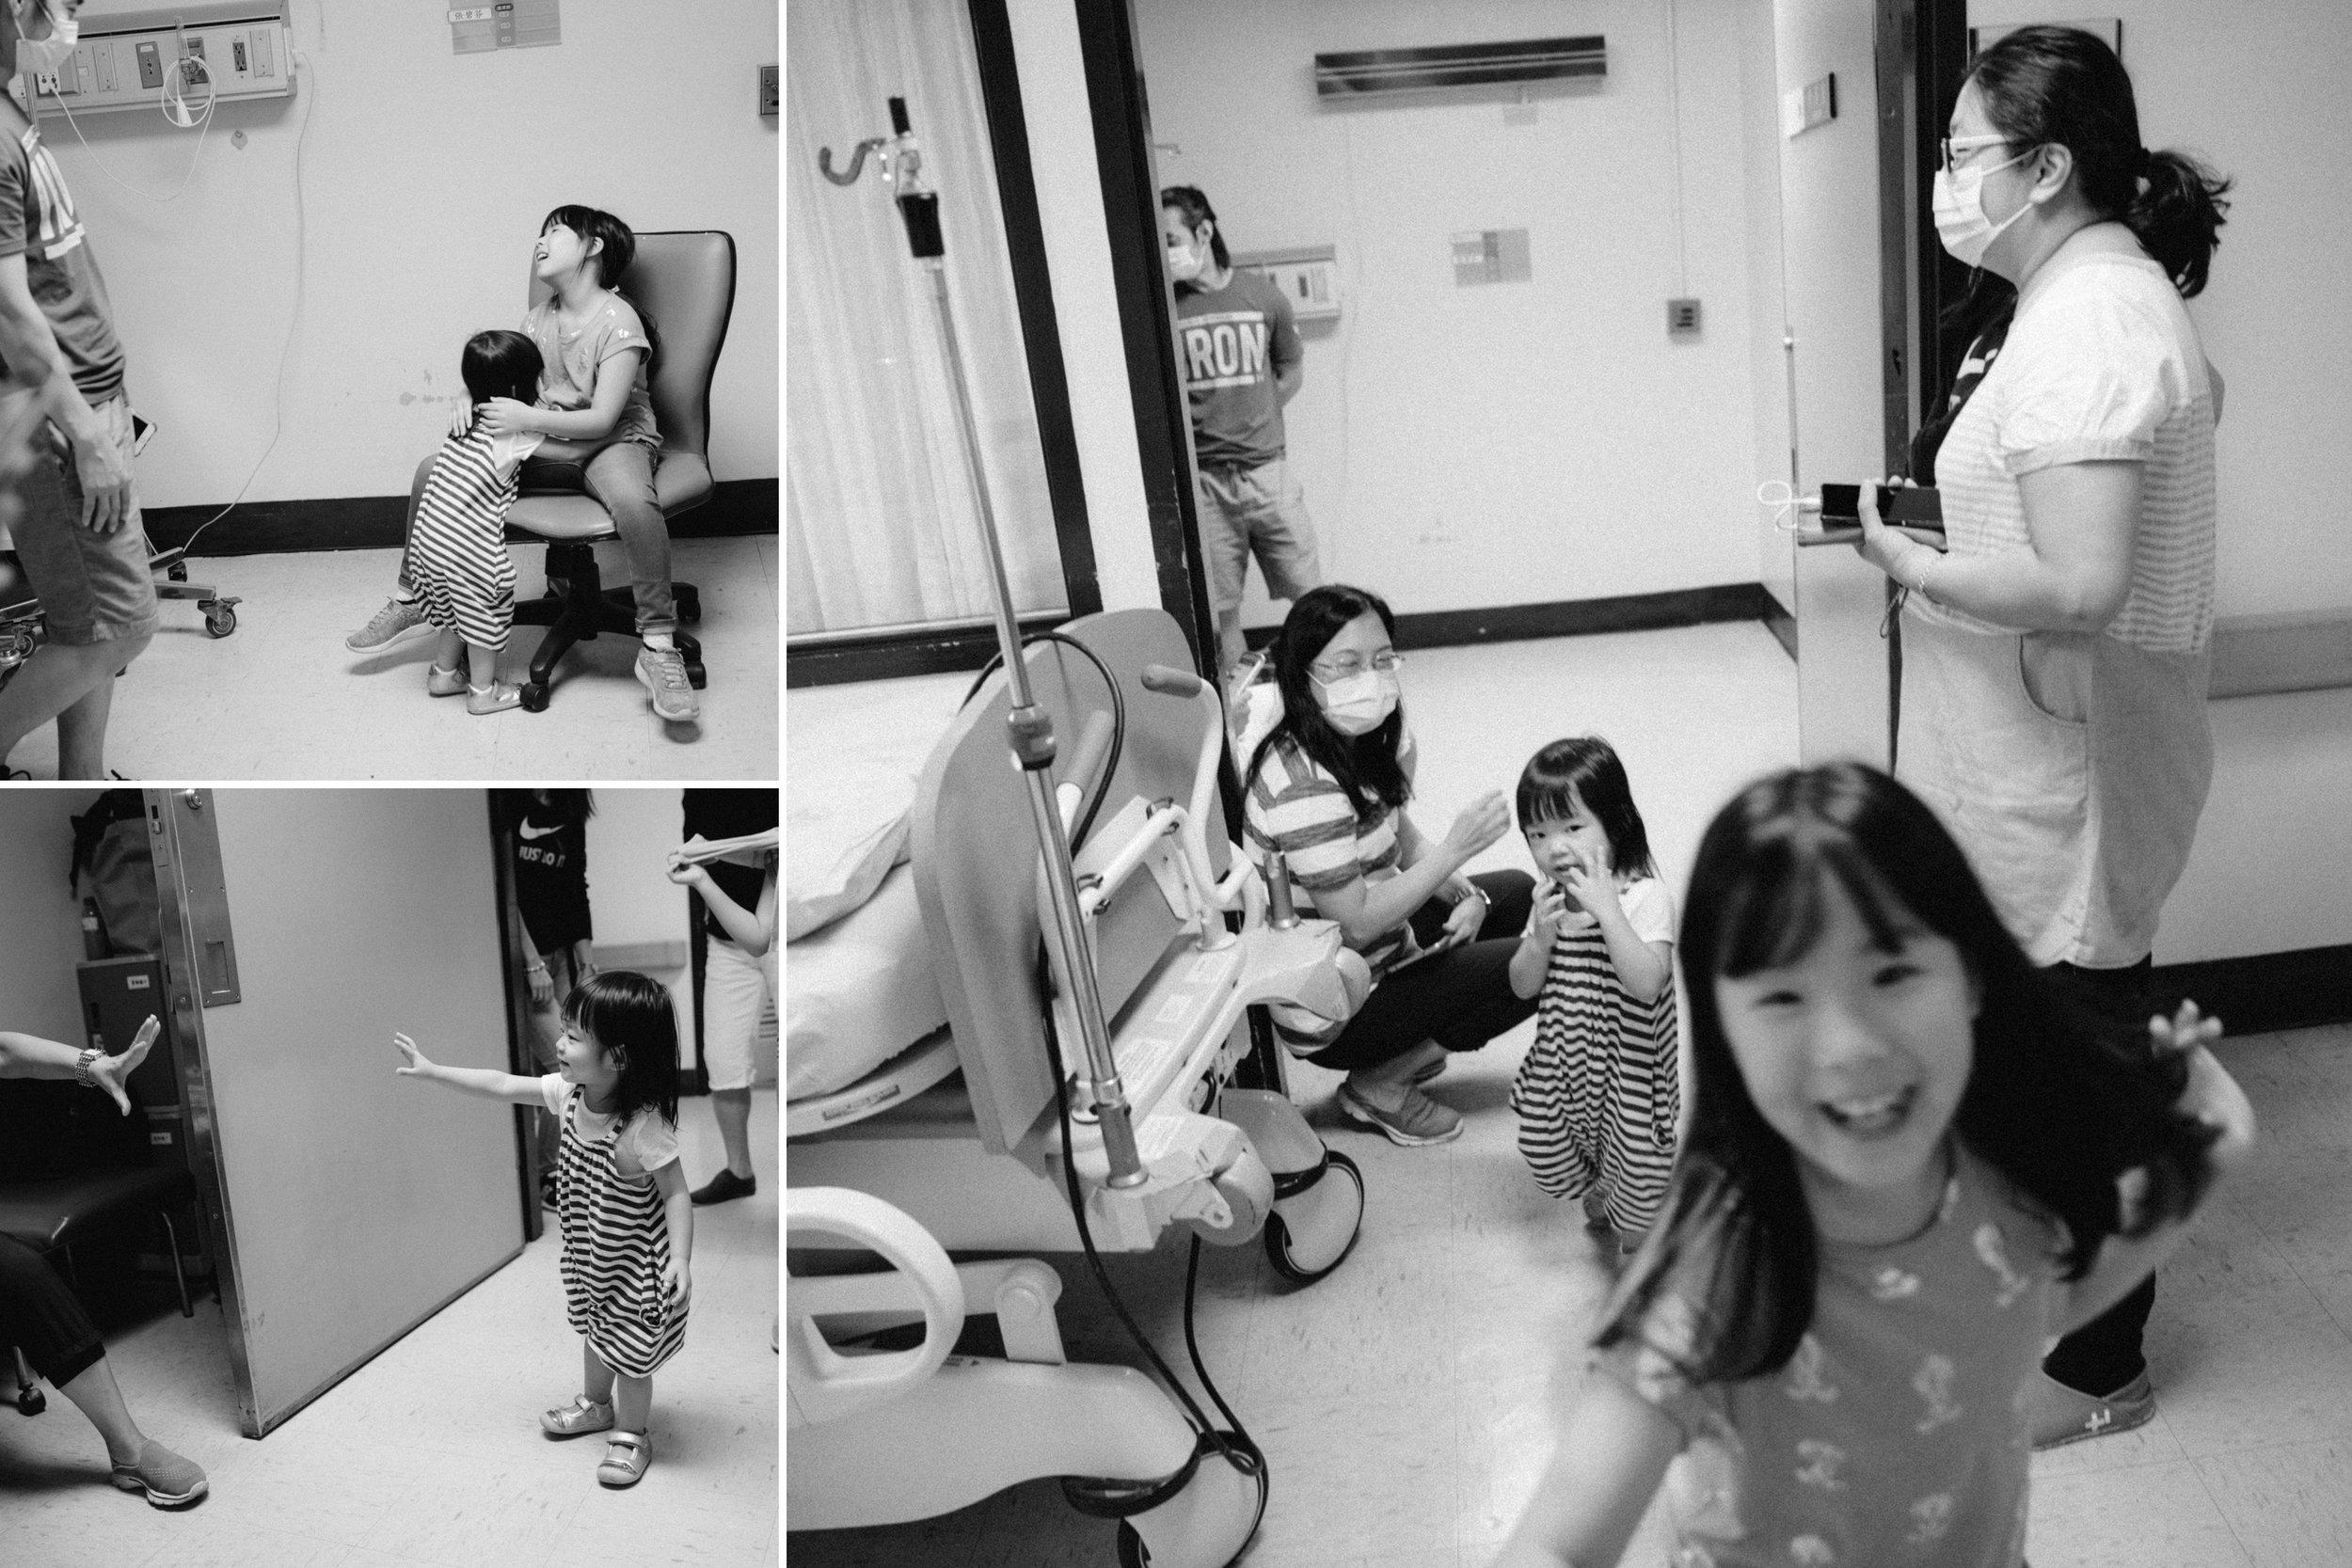 star-ken-firstday-newborn-baby-taipei-台北榮總-21.jpg